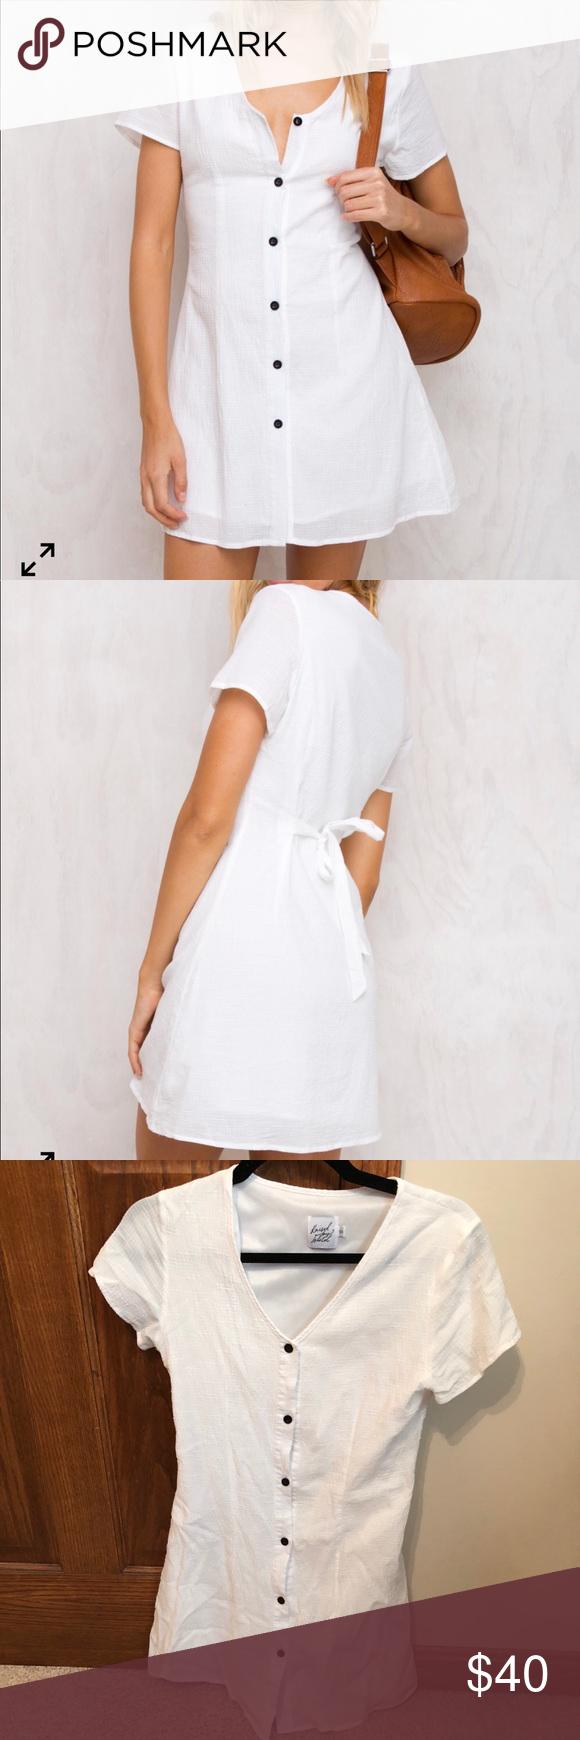 10e7a303eca White linen button up dress